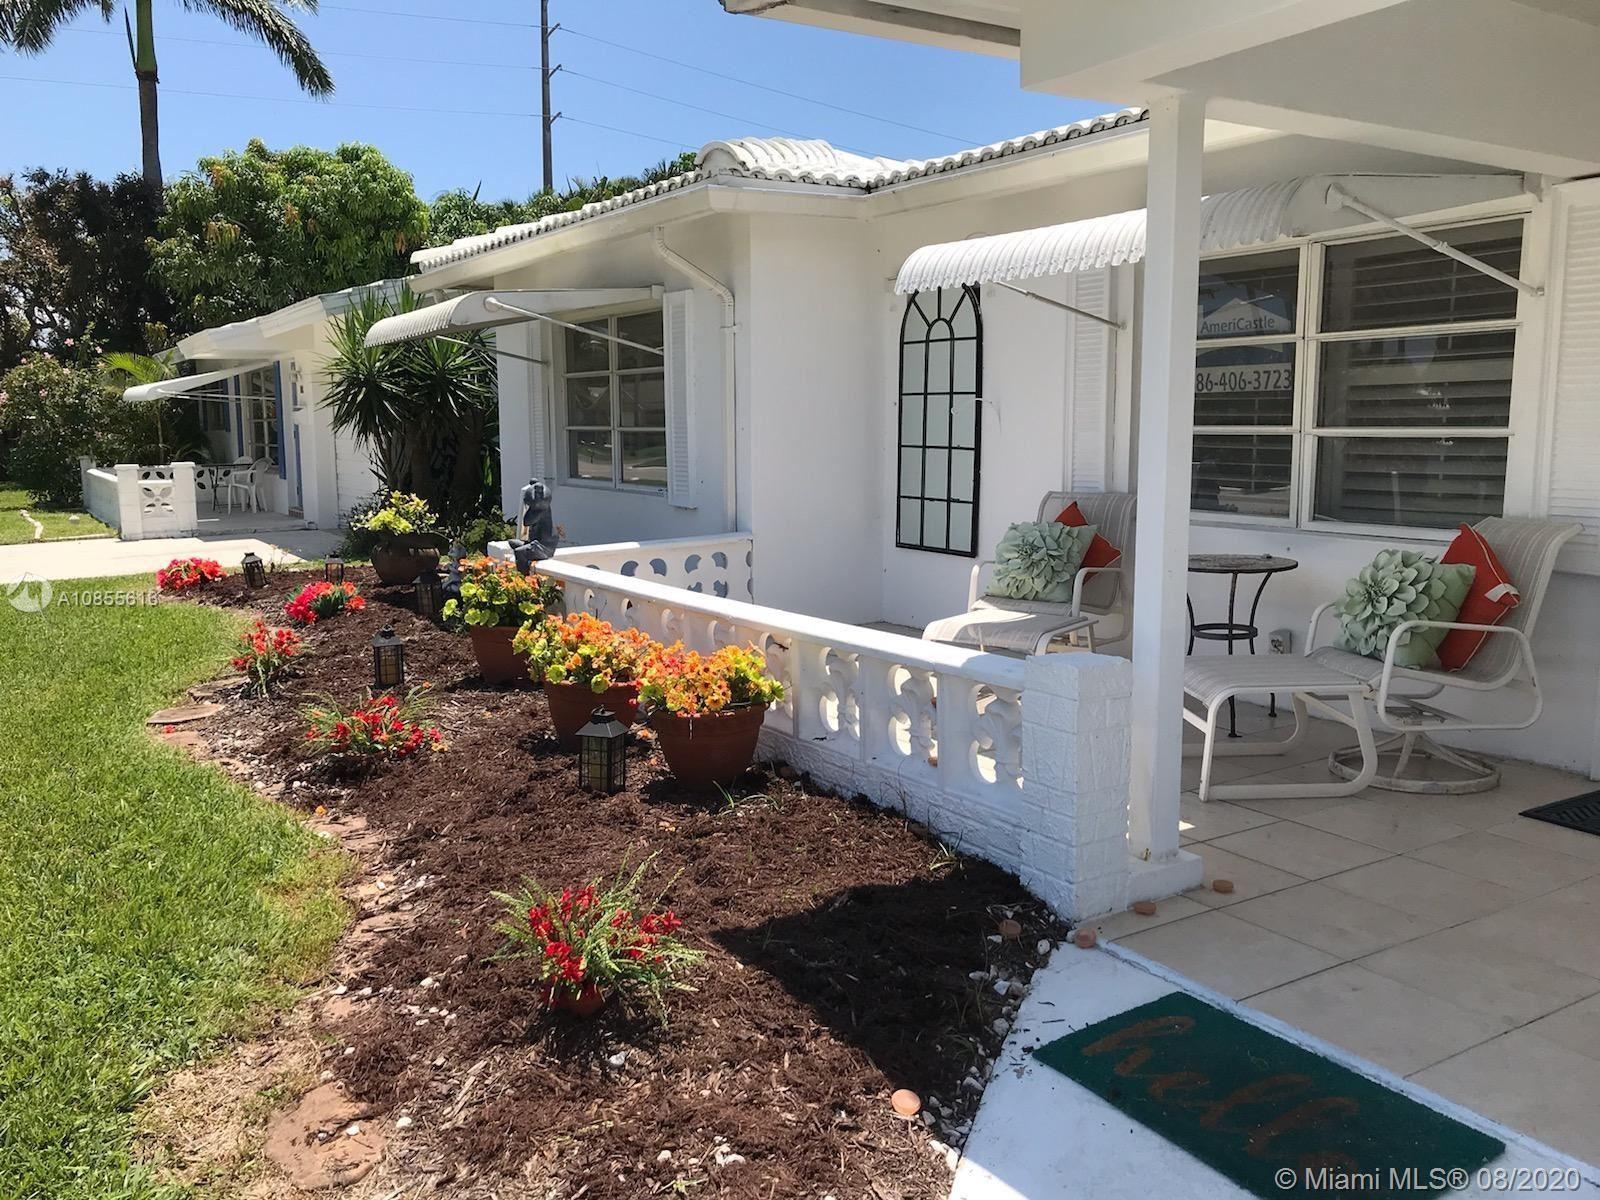 804 Ocean Dr, Boynton Beach, FL 33426 - #: A10855616